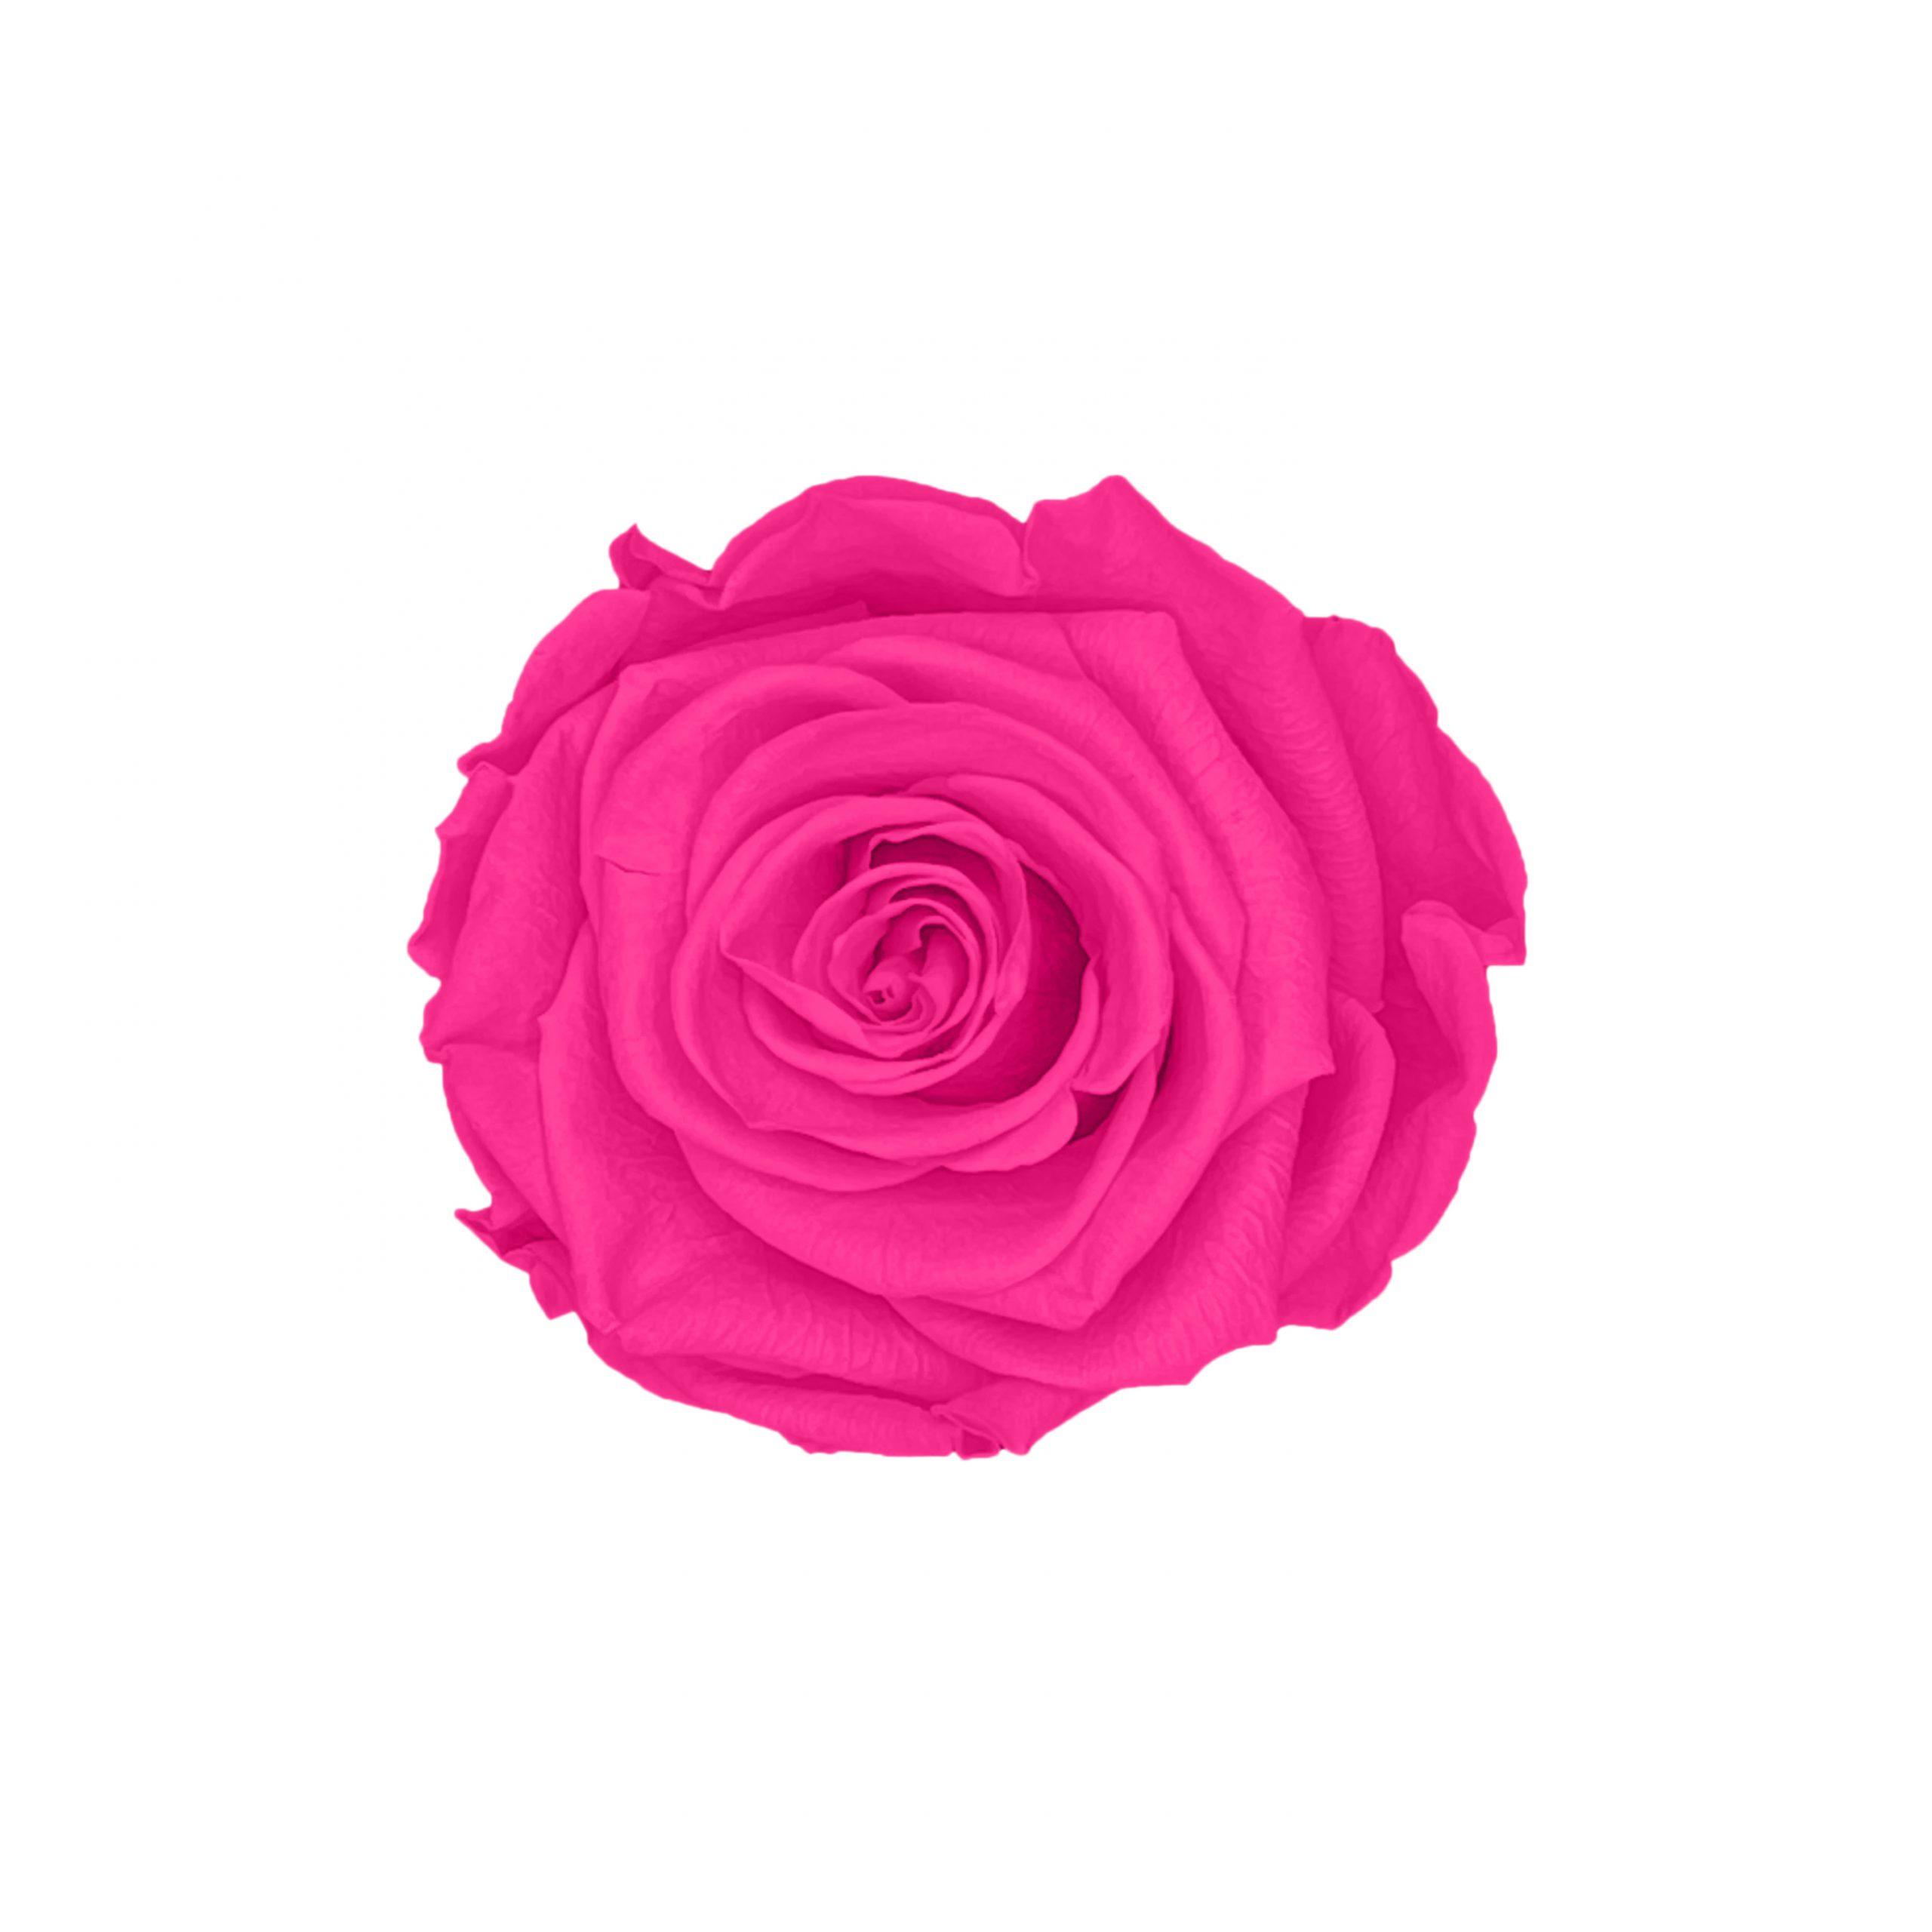 Infinity rose purple pink